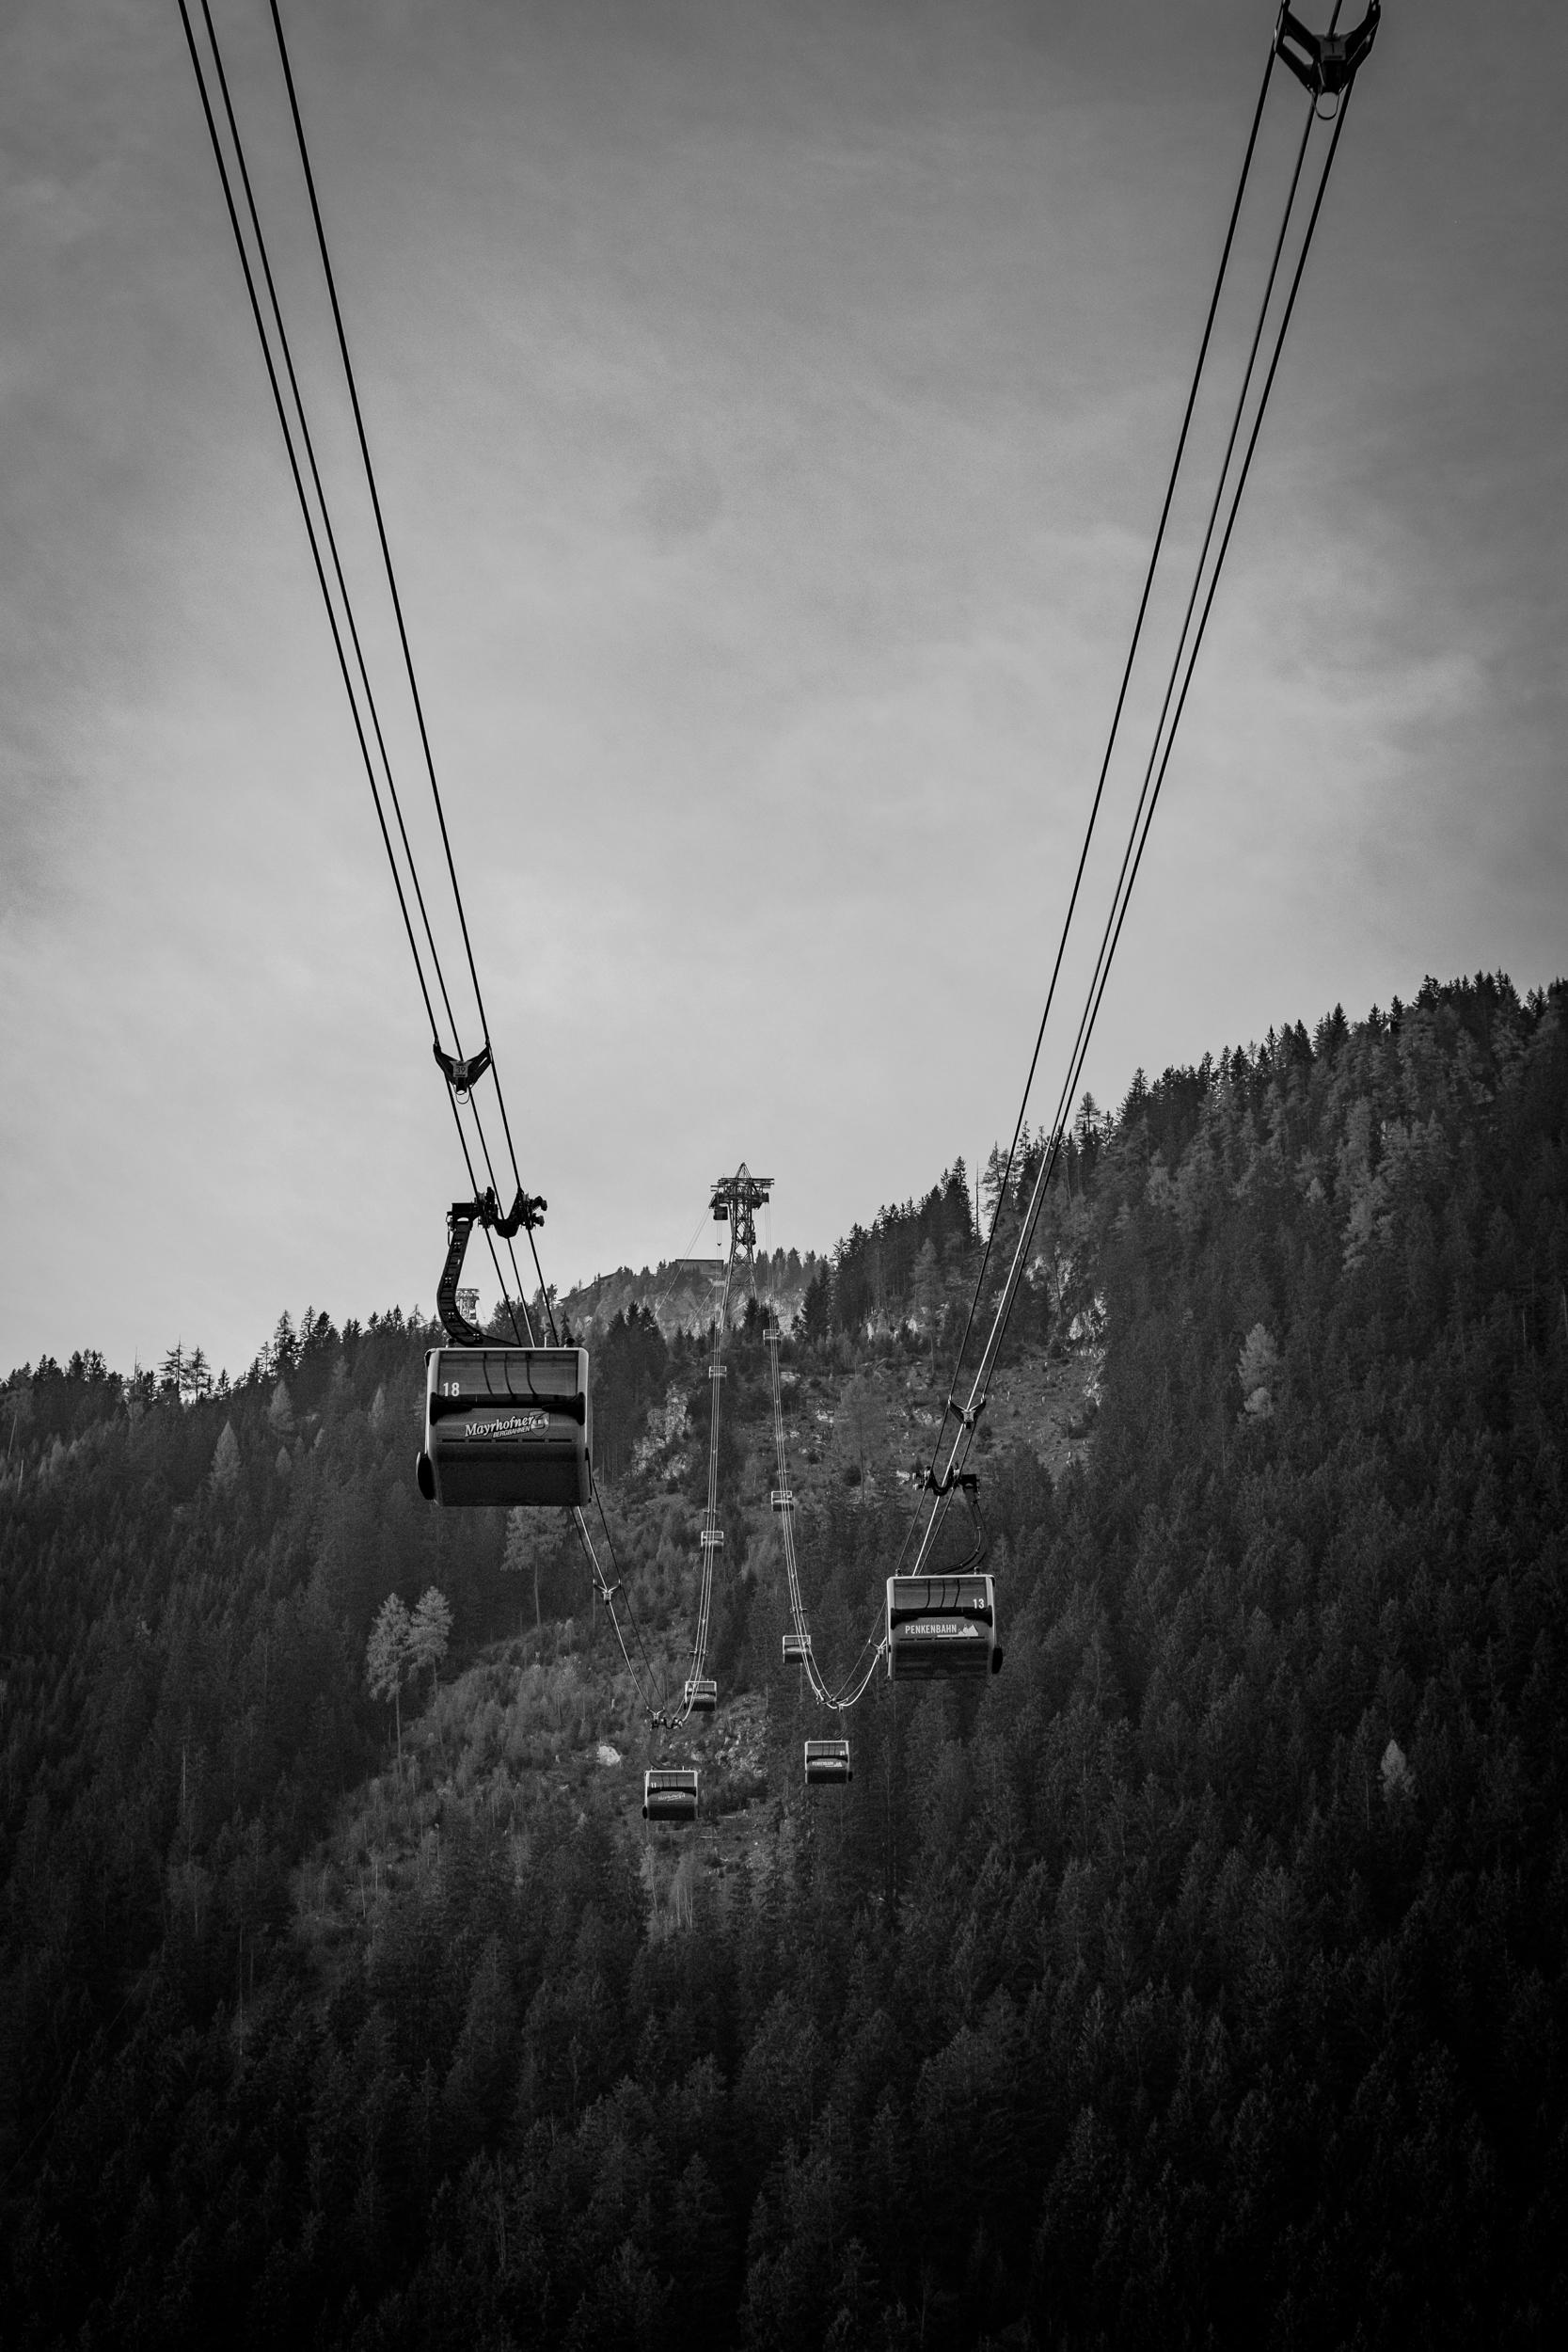 The Penkenbahn lift in Mayrhofen Fujifilm X-E1 with Olympus 50mm f1.8 shot at 1/500 sec f5.6ISO 200